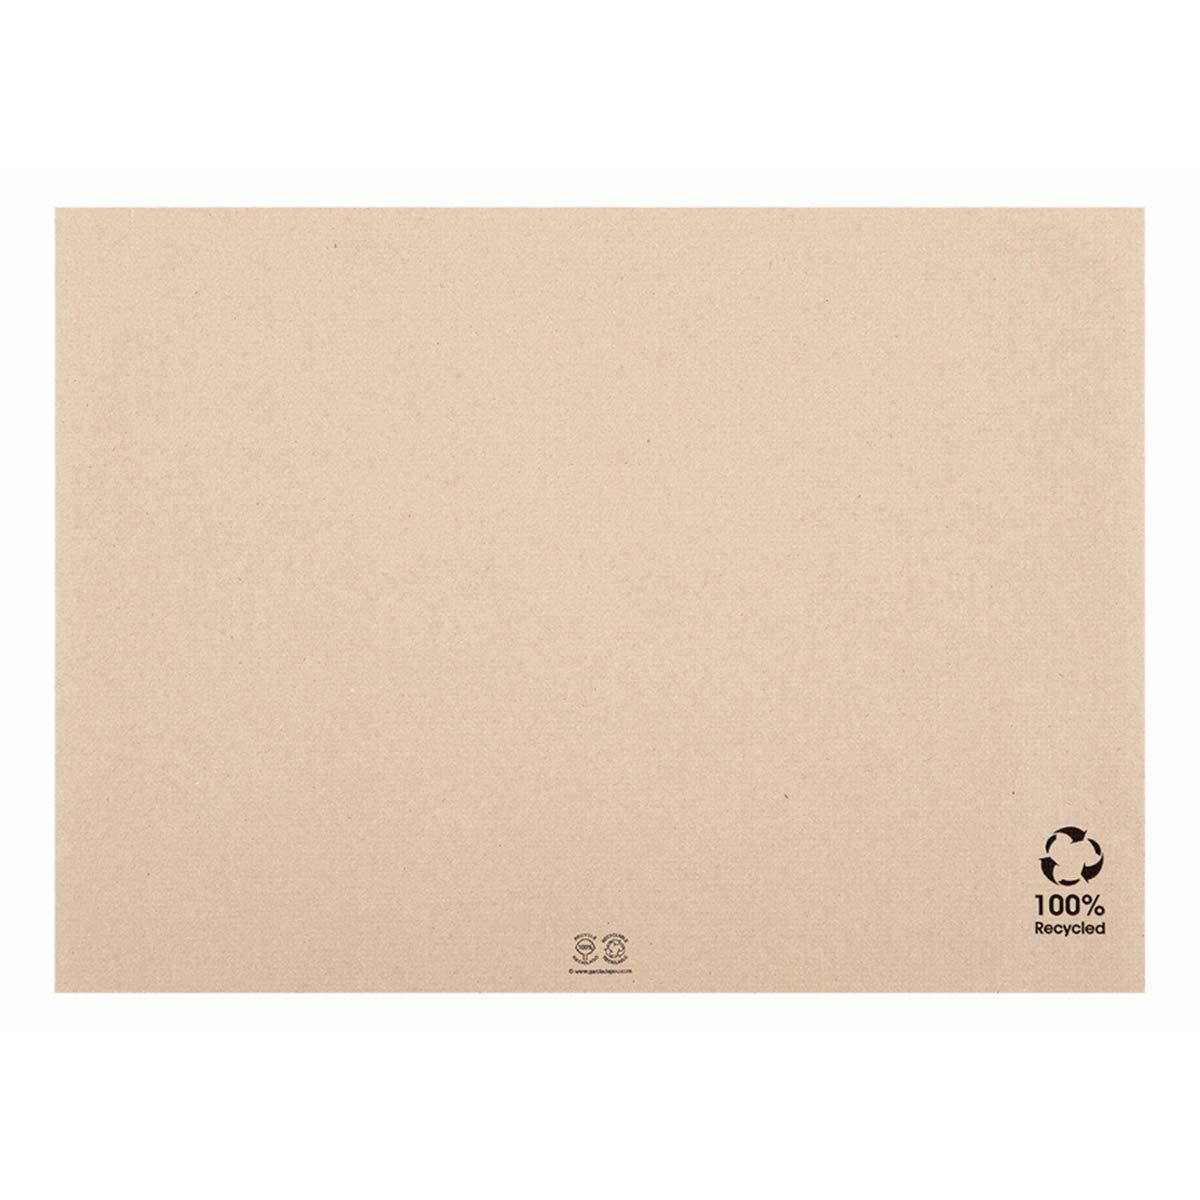 García de Pou Mantelines, Papel Reciclado, natural, 31x43 cm, 500